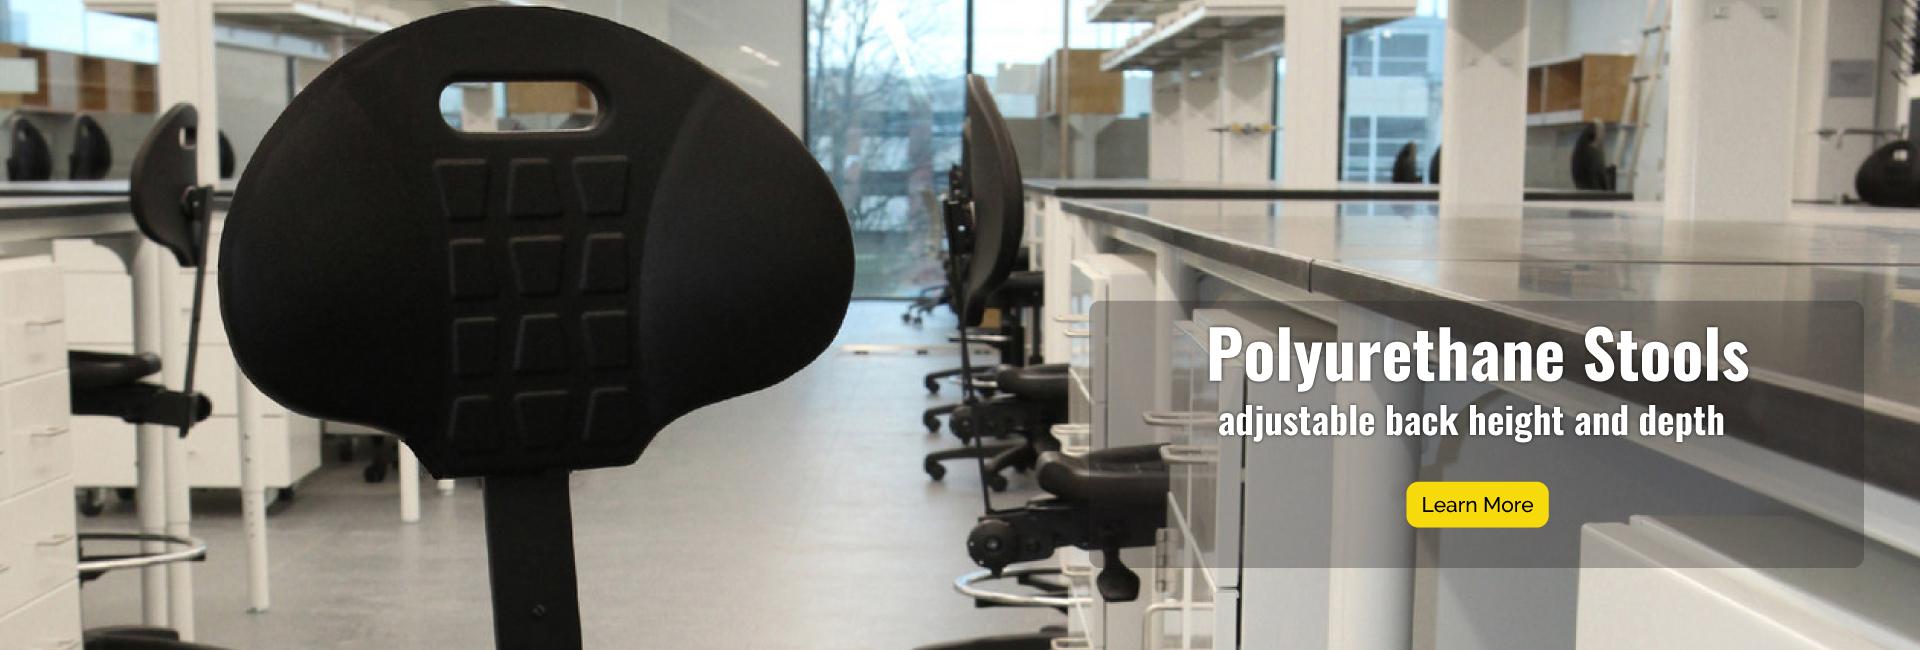 Polyurethane Stools have adjustable back height